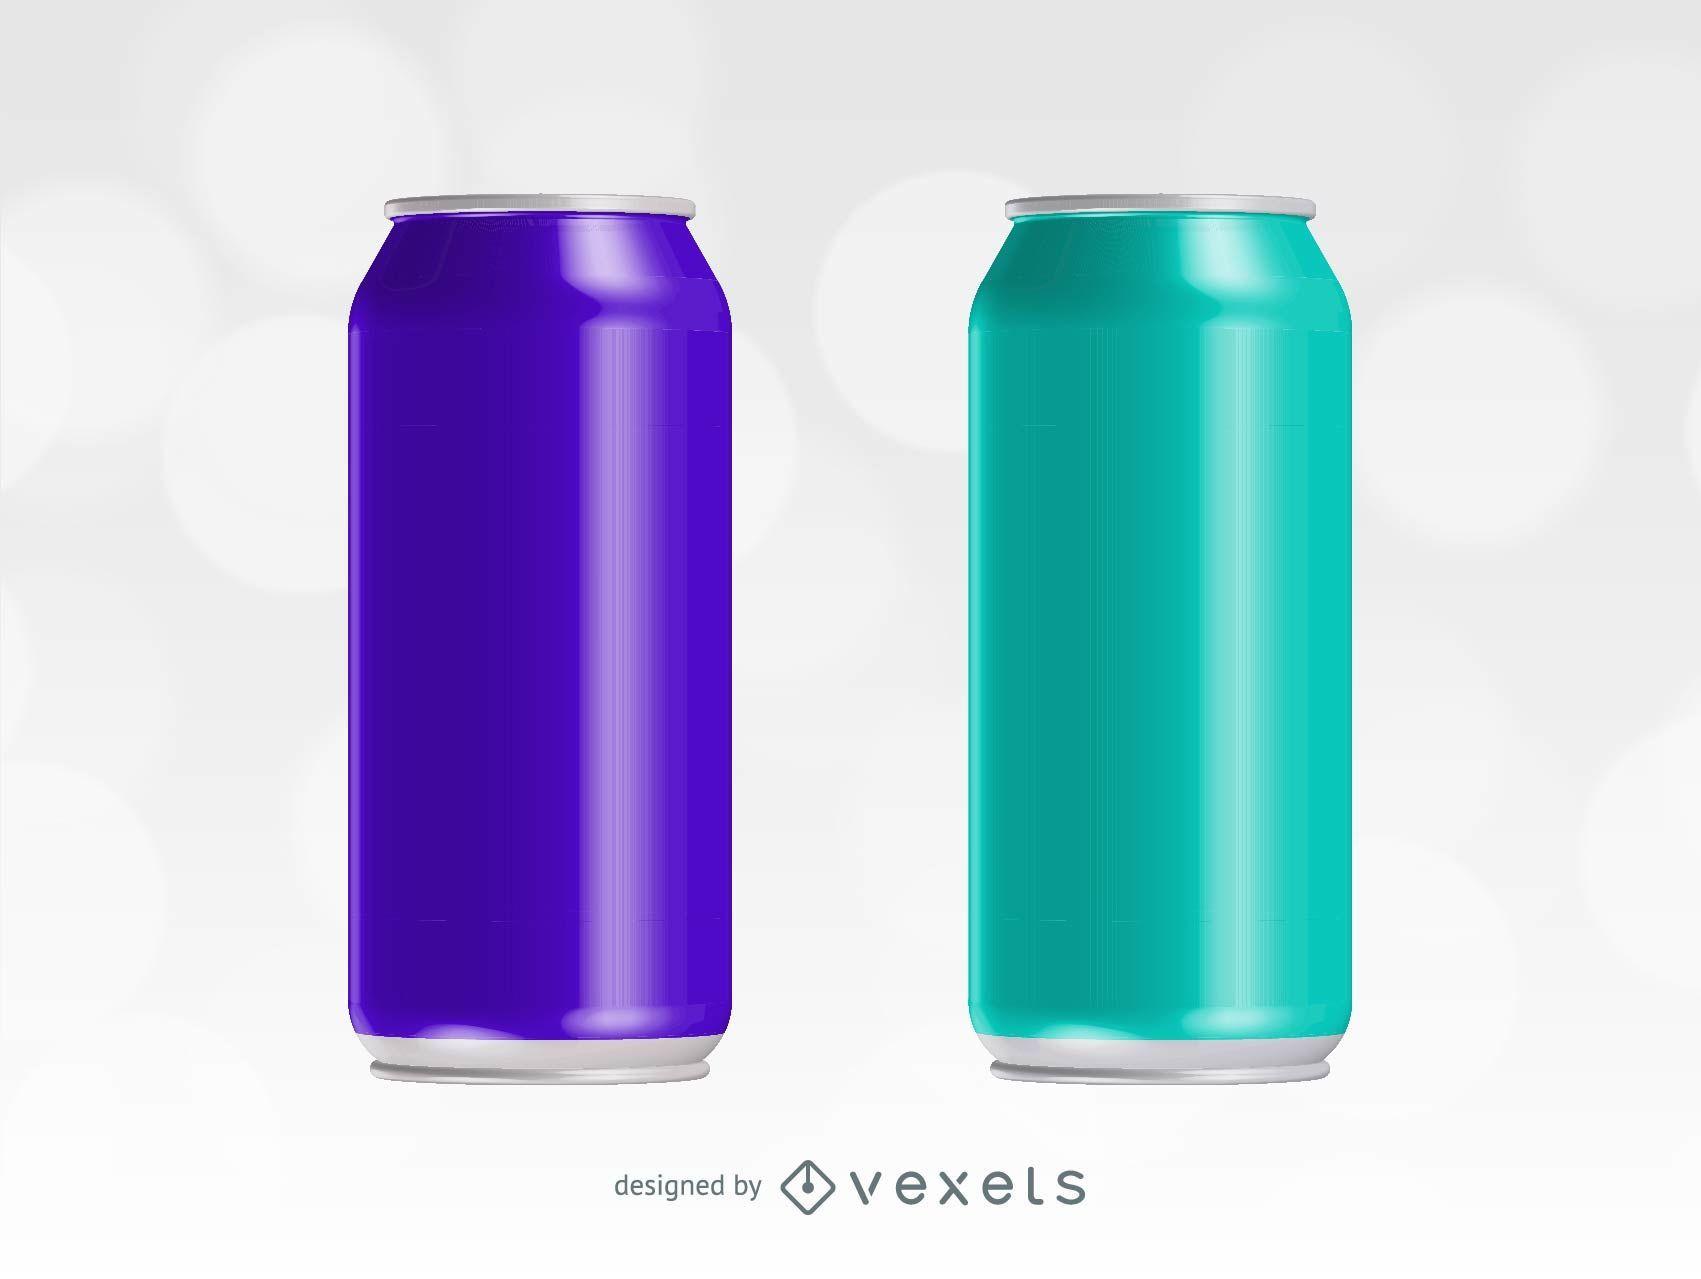 Vetor de bebida energética pode